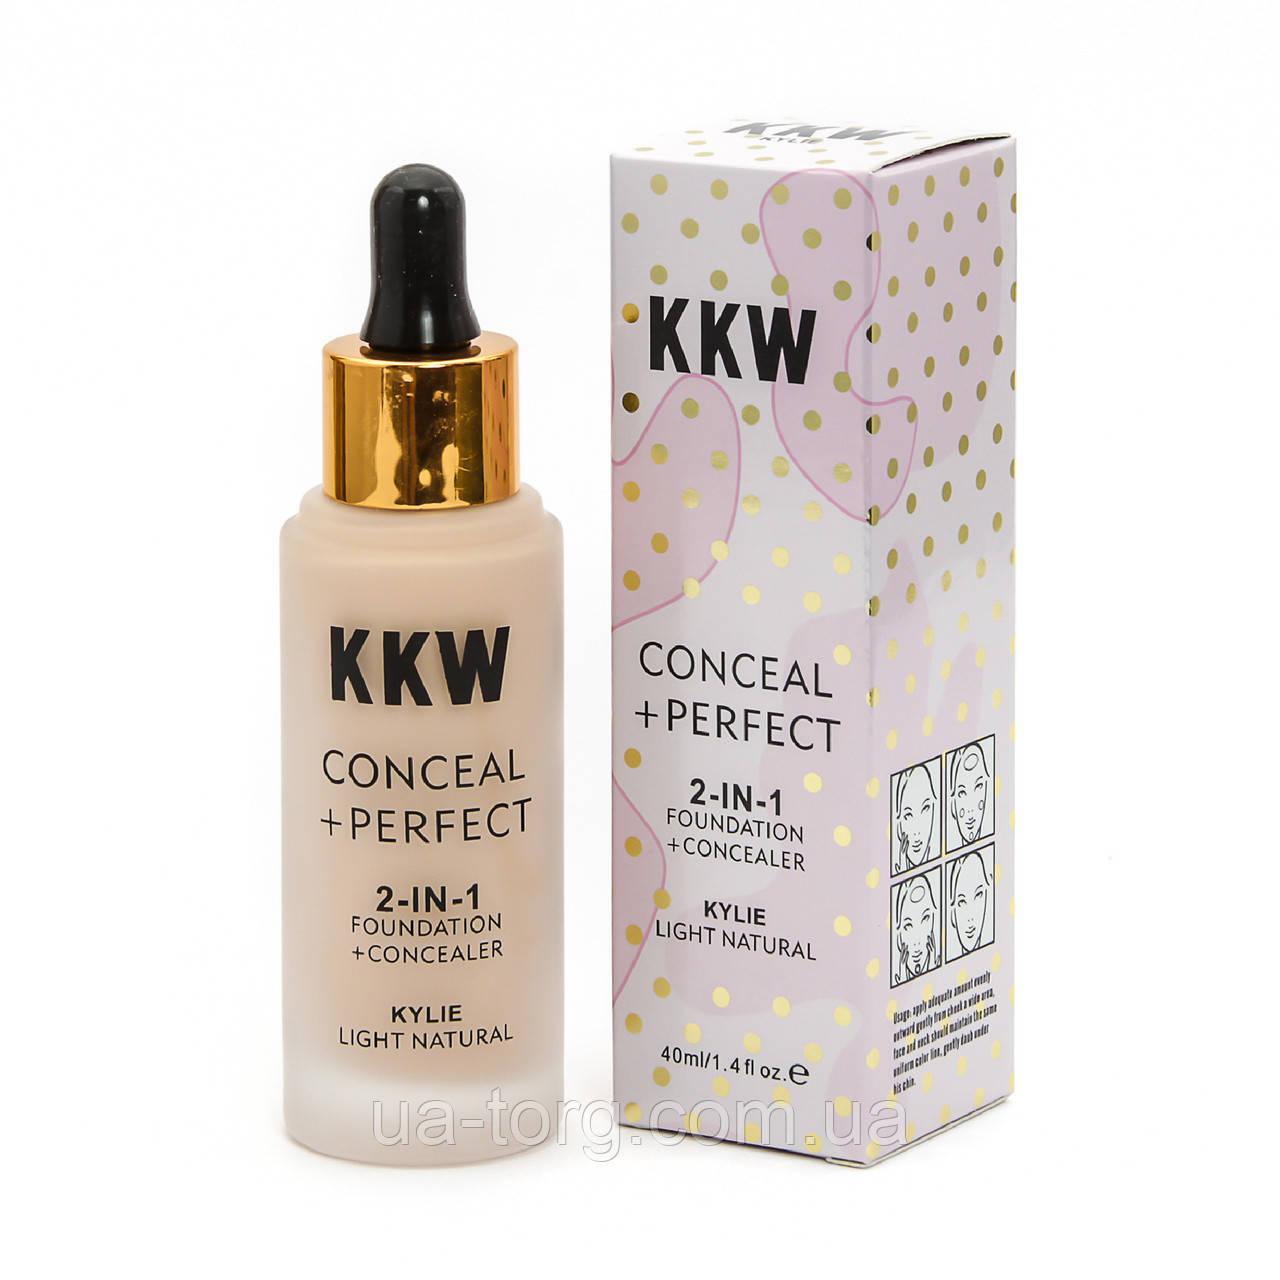 Тональный крем + консилер 2IN1 KYLIE 40 ml